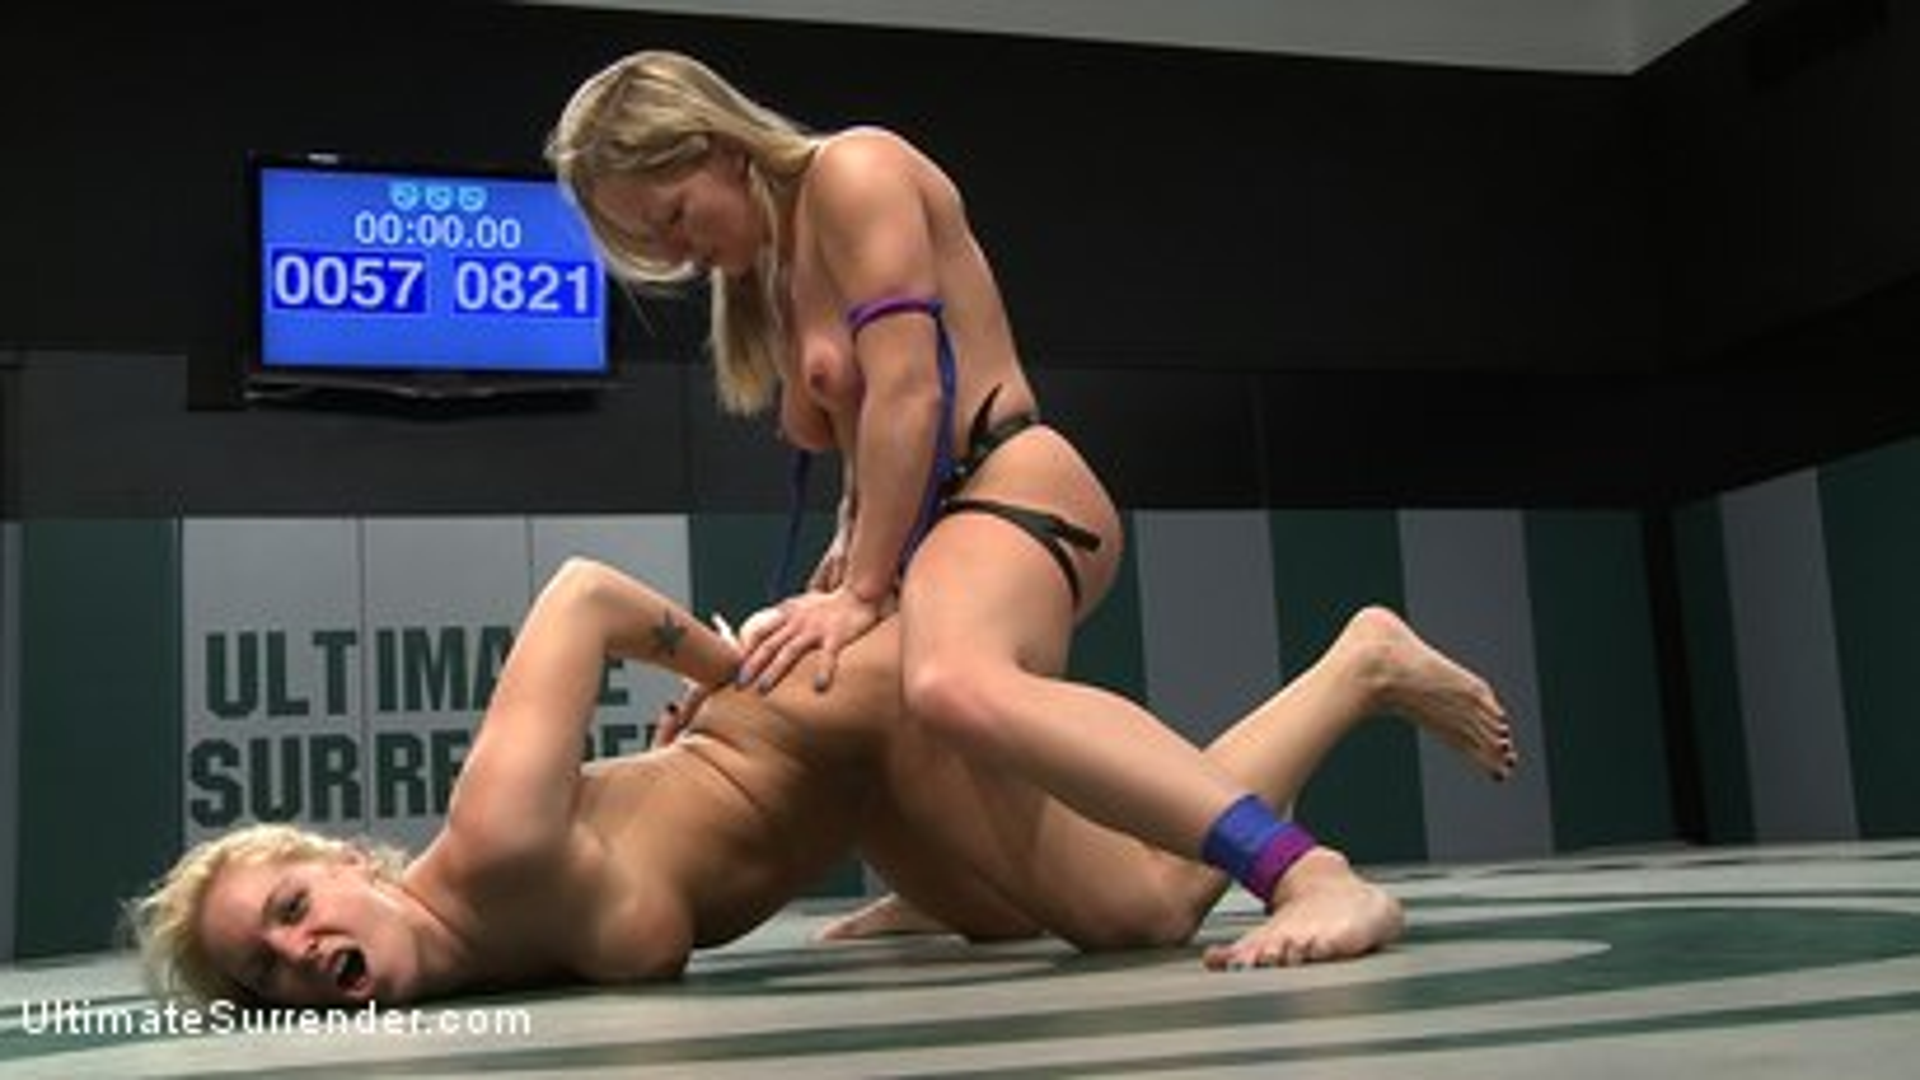 Photo number 14 from 2 blond Amazons battle.<br>Smaller girl destroys bigger. Fingers her on the mat then fucks her. shot for Ultimate Surrender on Kink.com. Featuring Hollie Stevens and Dia Zerva in hardcore BDSM & Fetish porn.